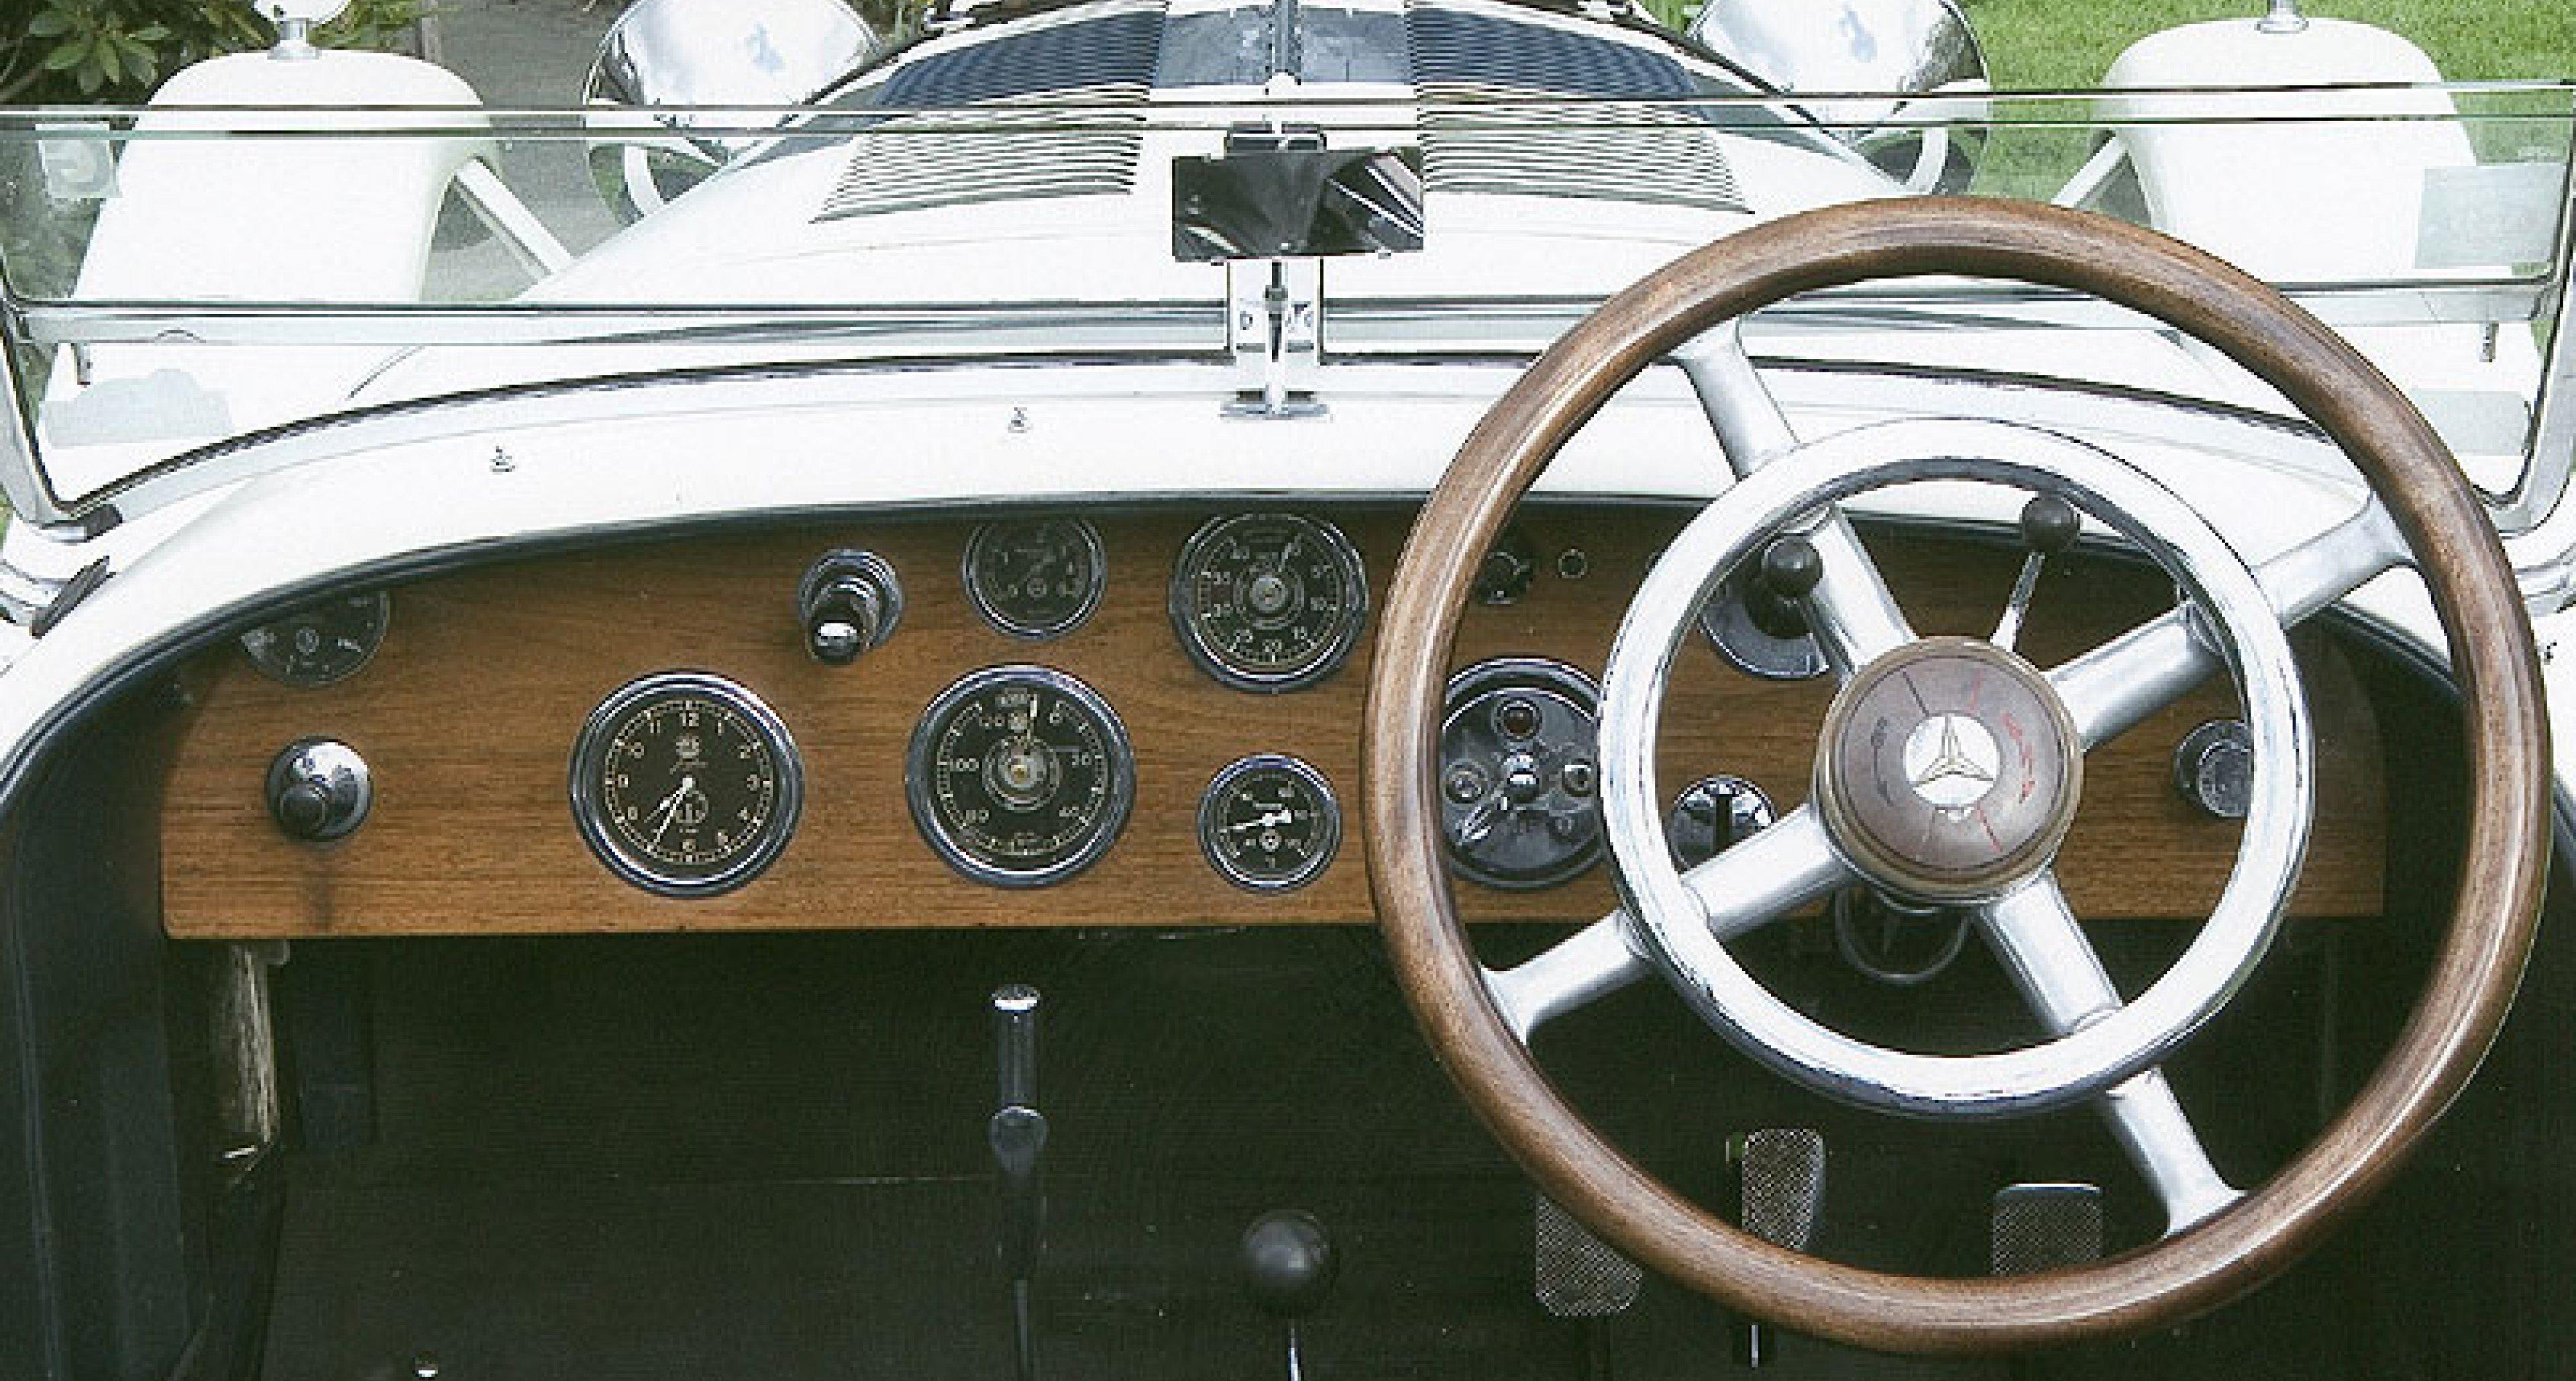 Rare Mercedes-Benz 'S' type sports tourer comes to market